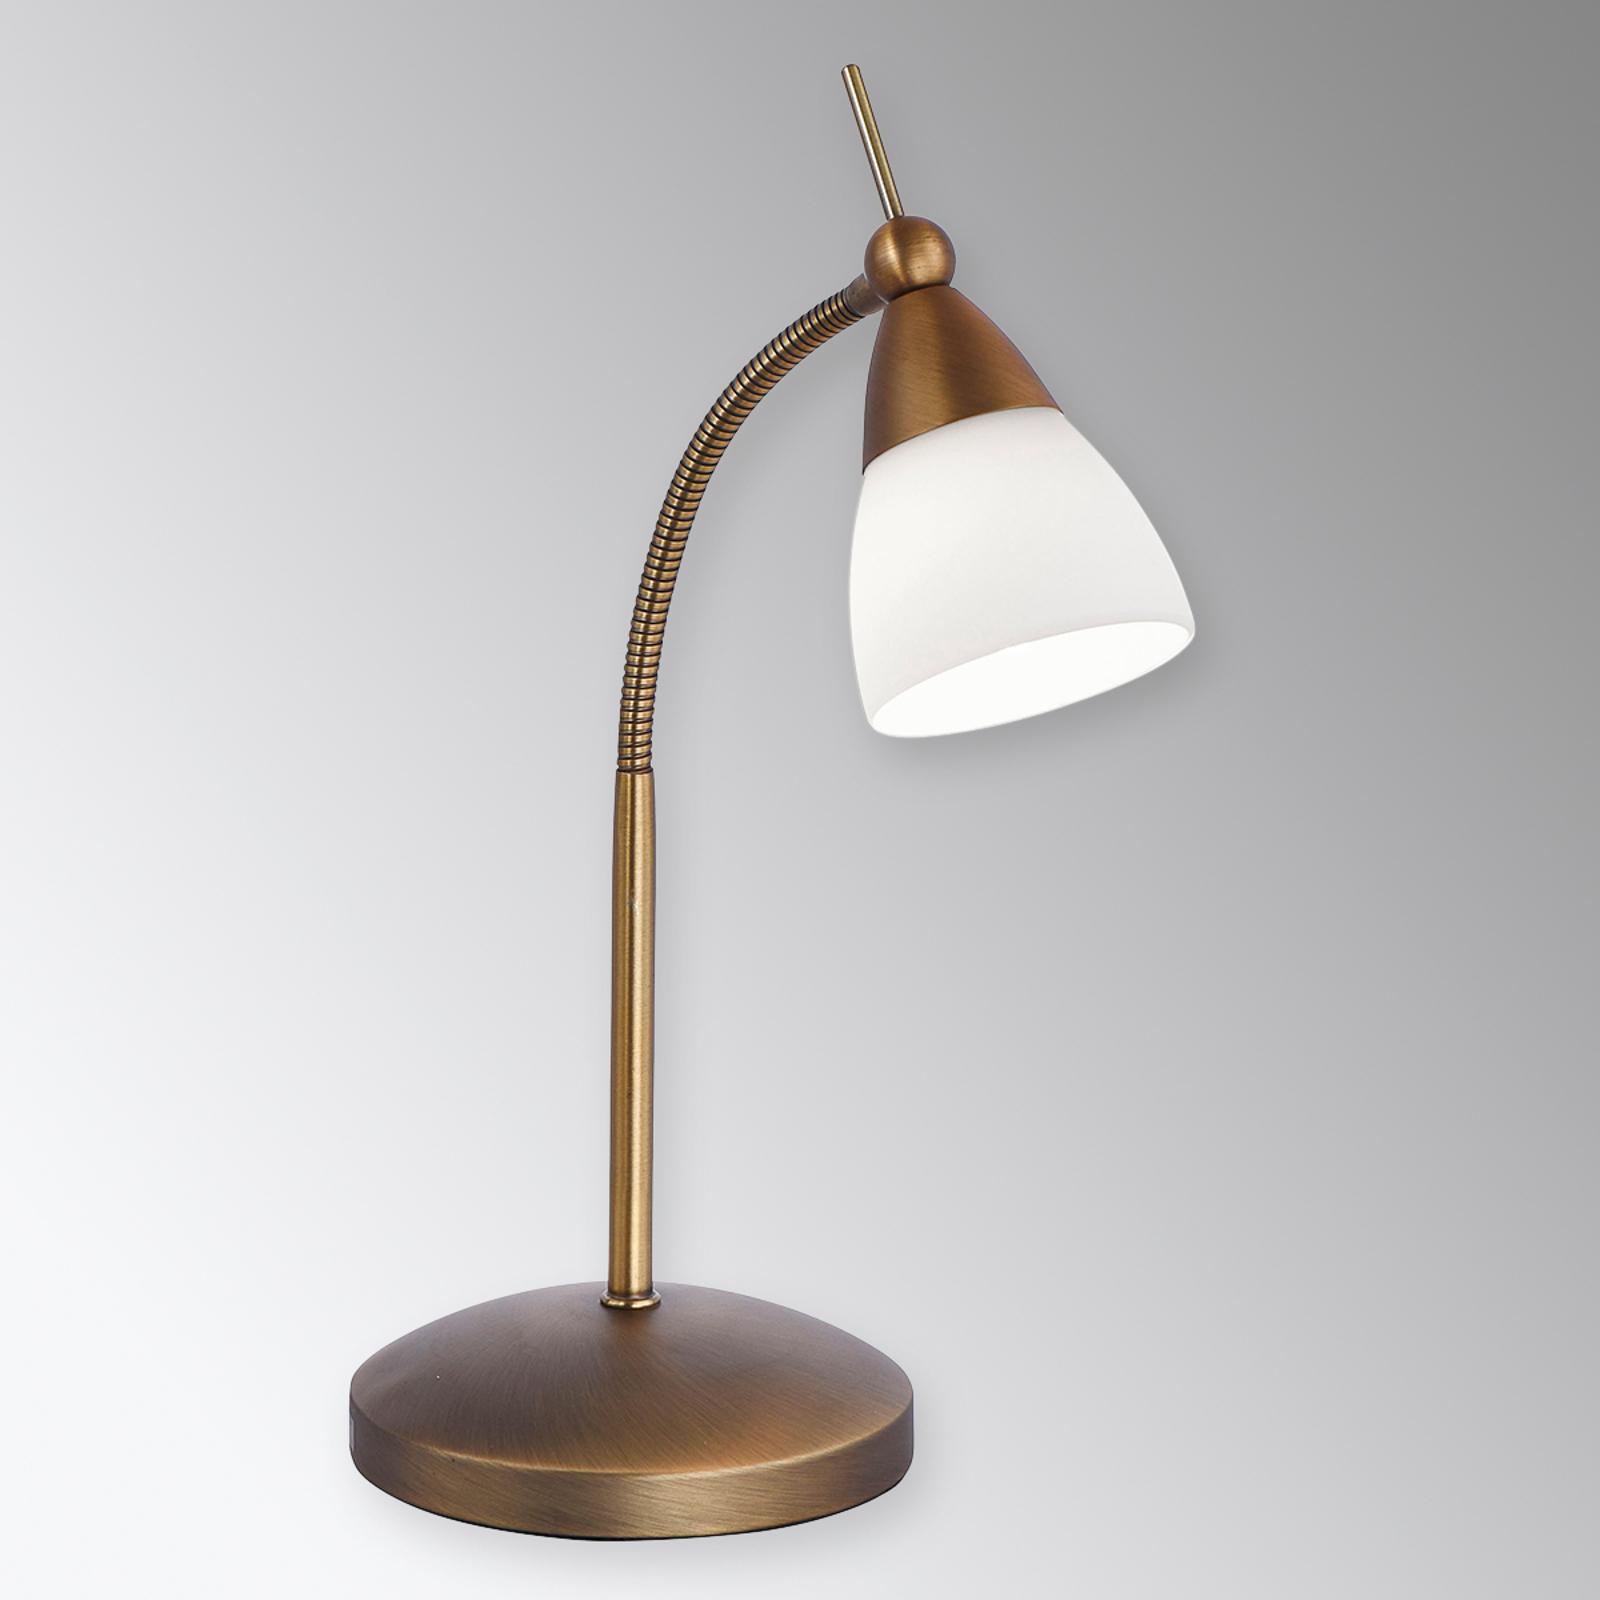 Klassinen LED-pöytälamppu Pino, vanha messinki